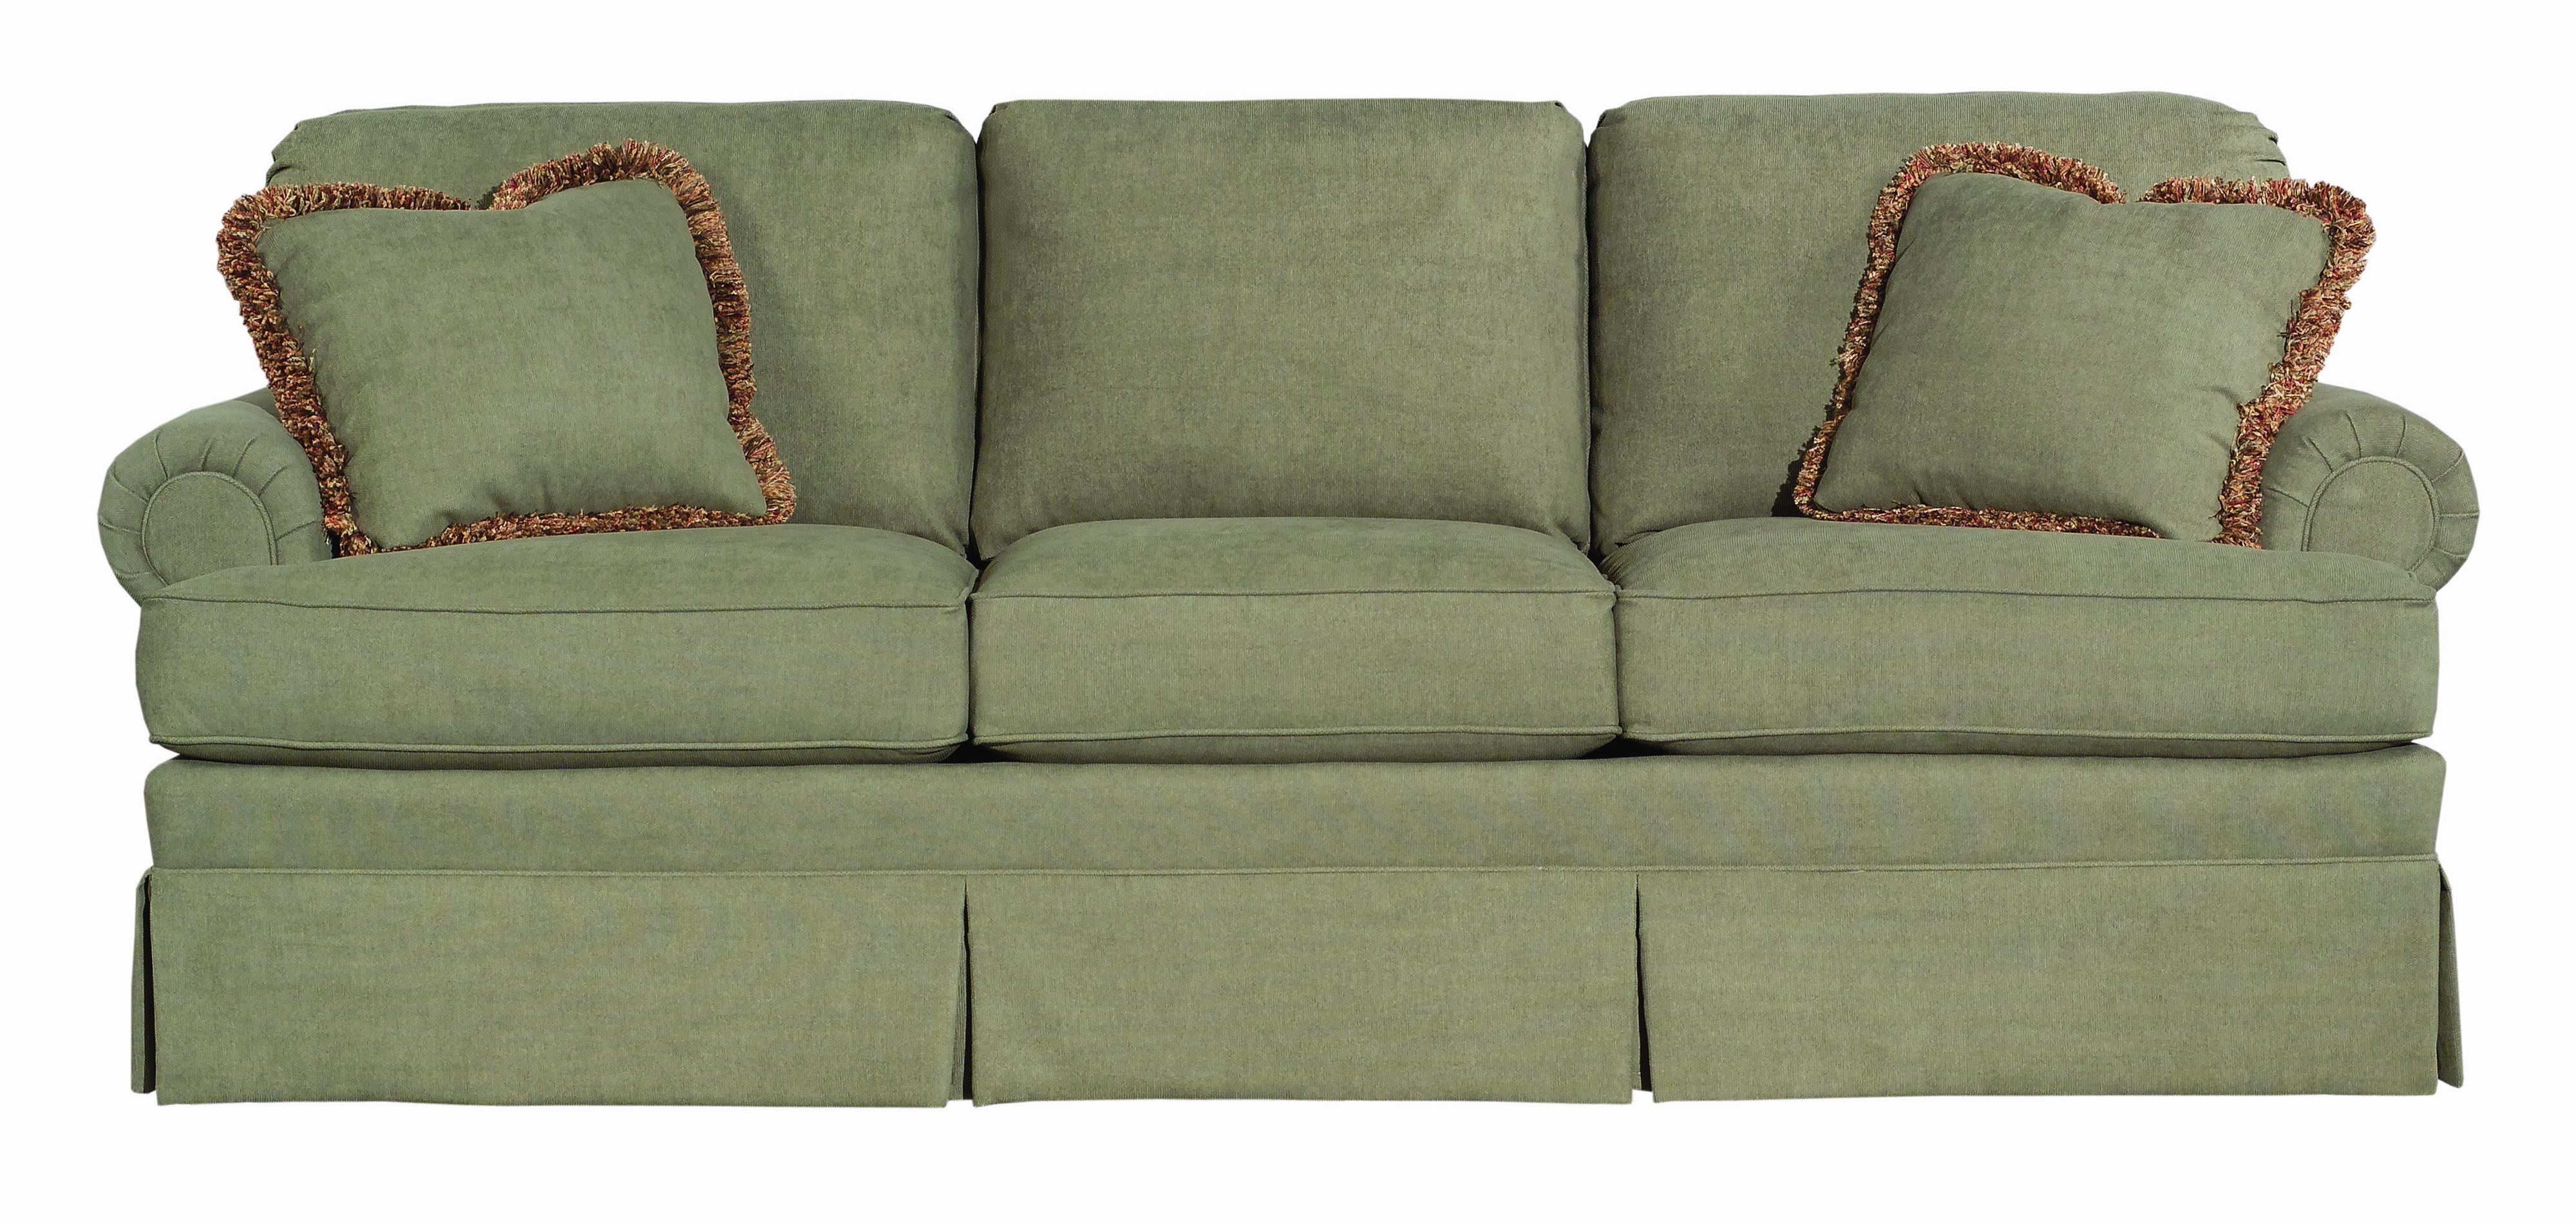 Charlotte Stationary Sofa by Kincaid Furniture at Johnny Janosik